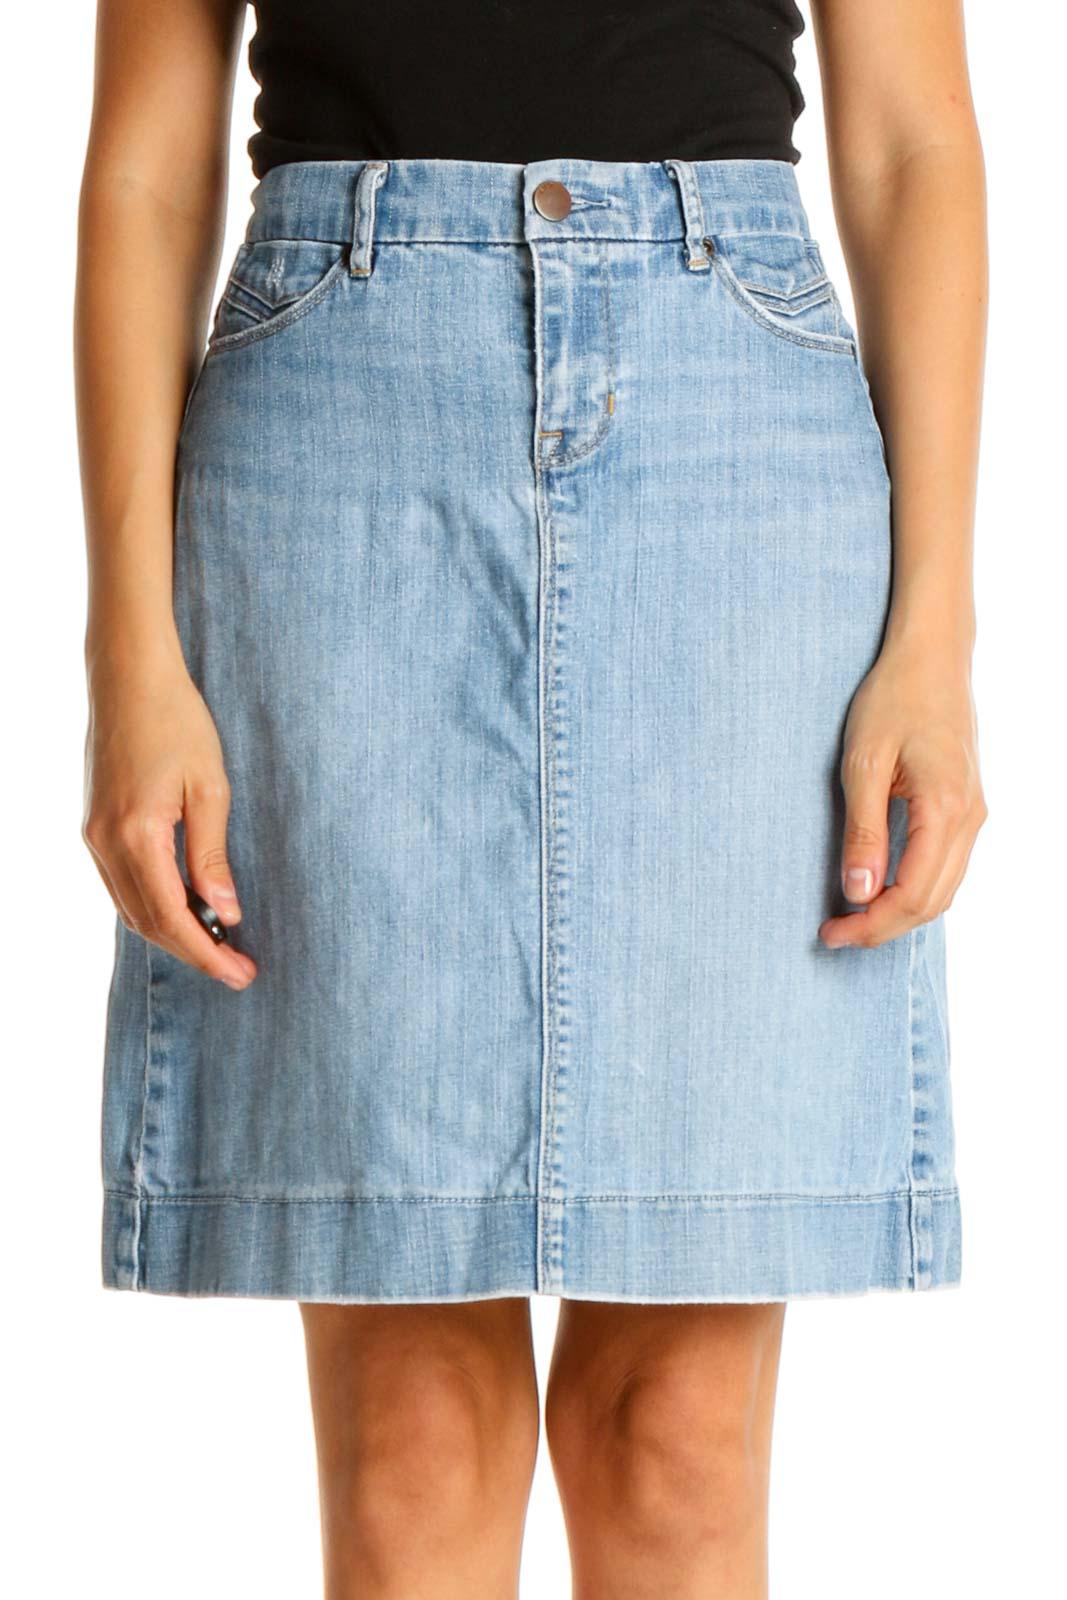 Blue Denim Chic A-Line Skirt Front